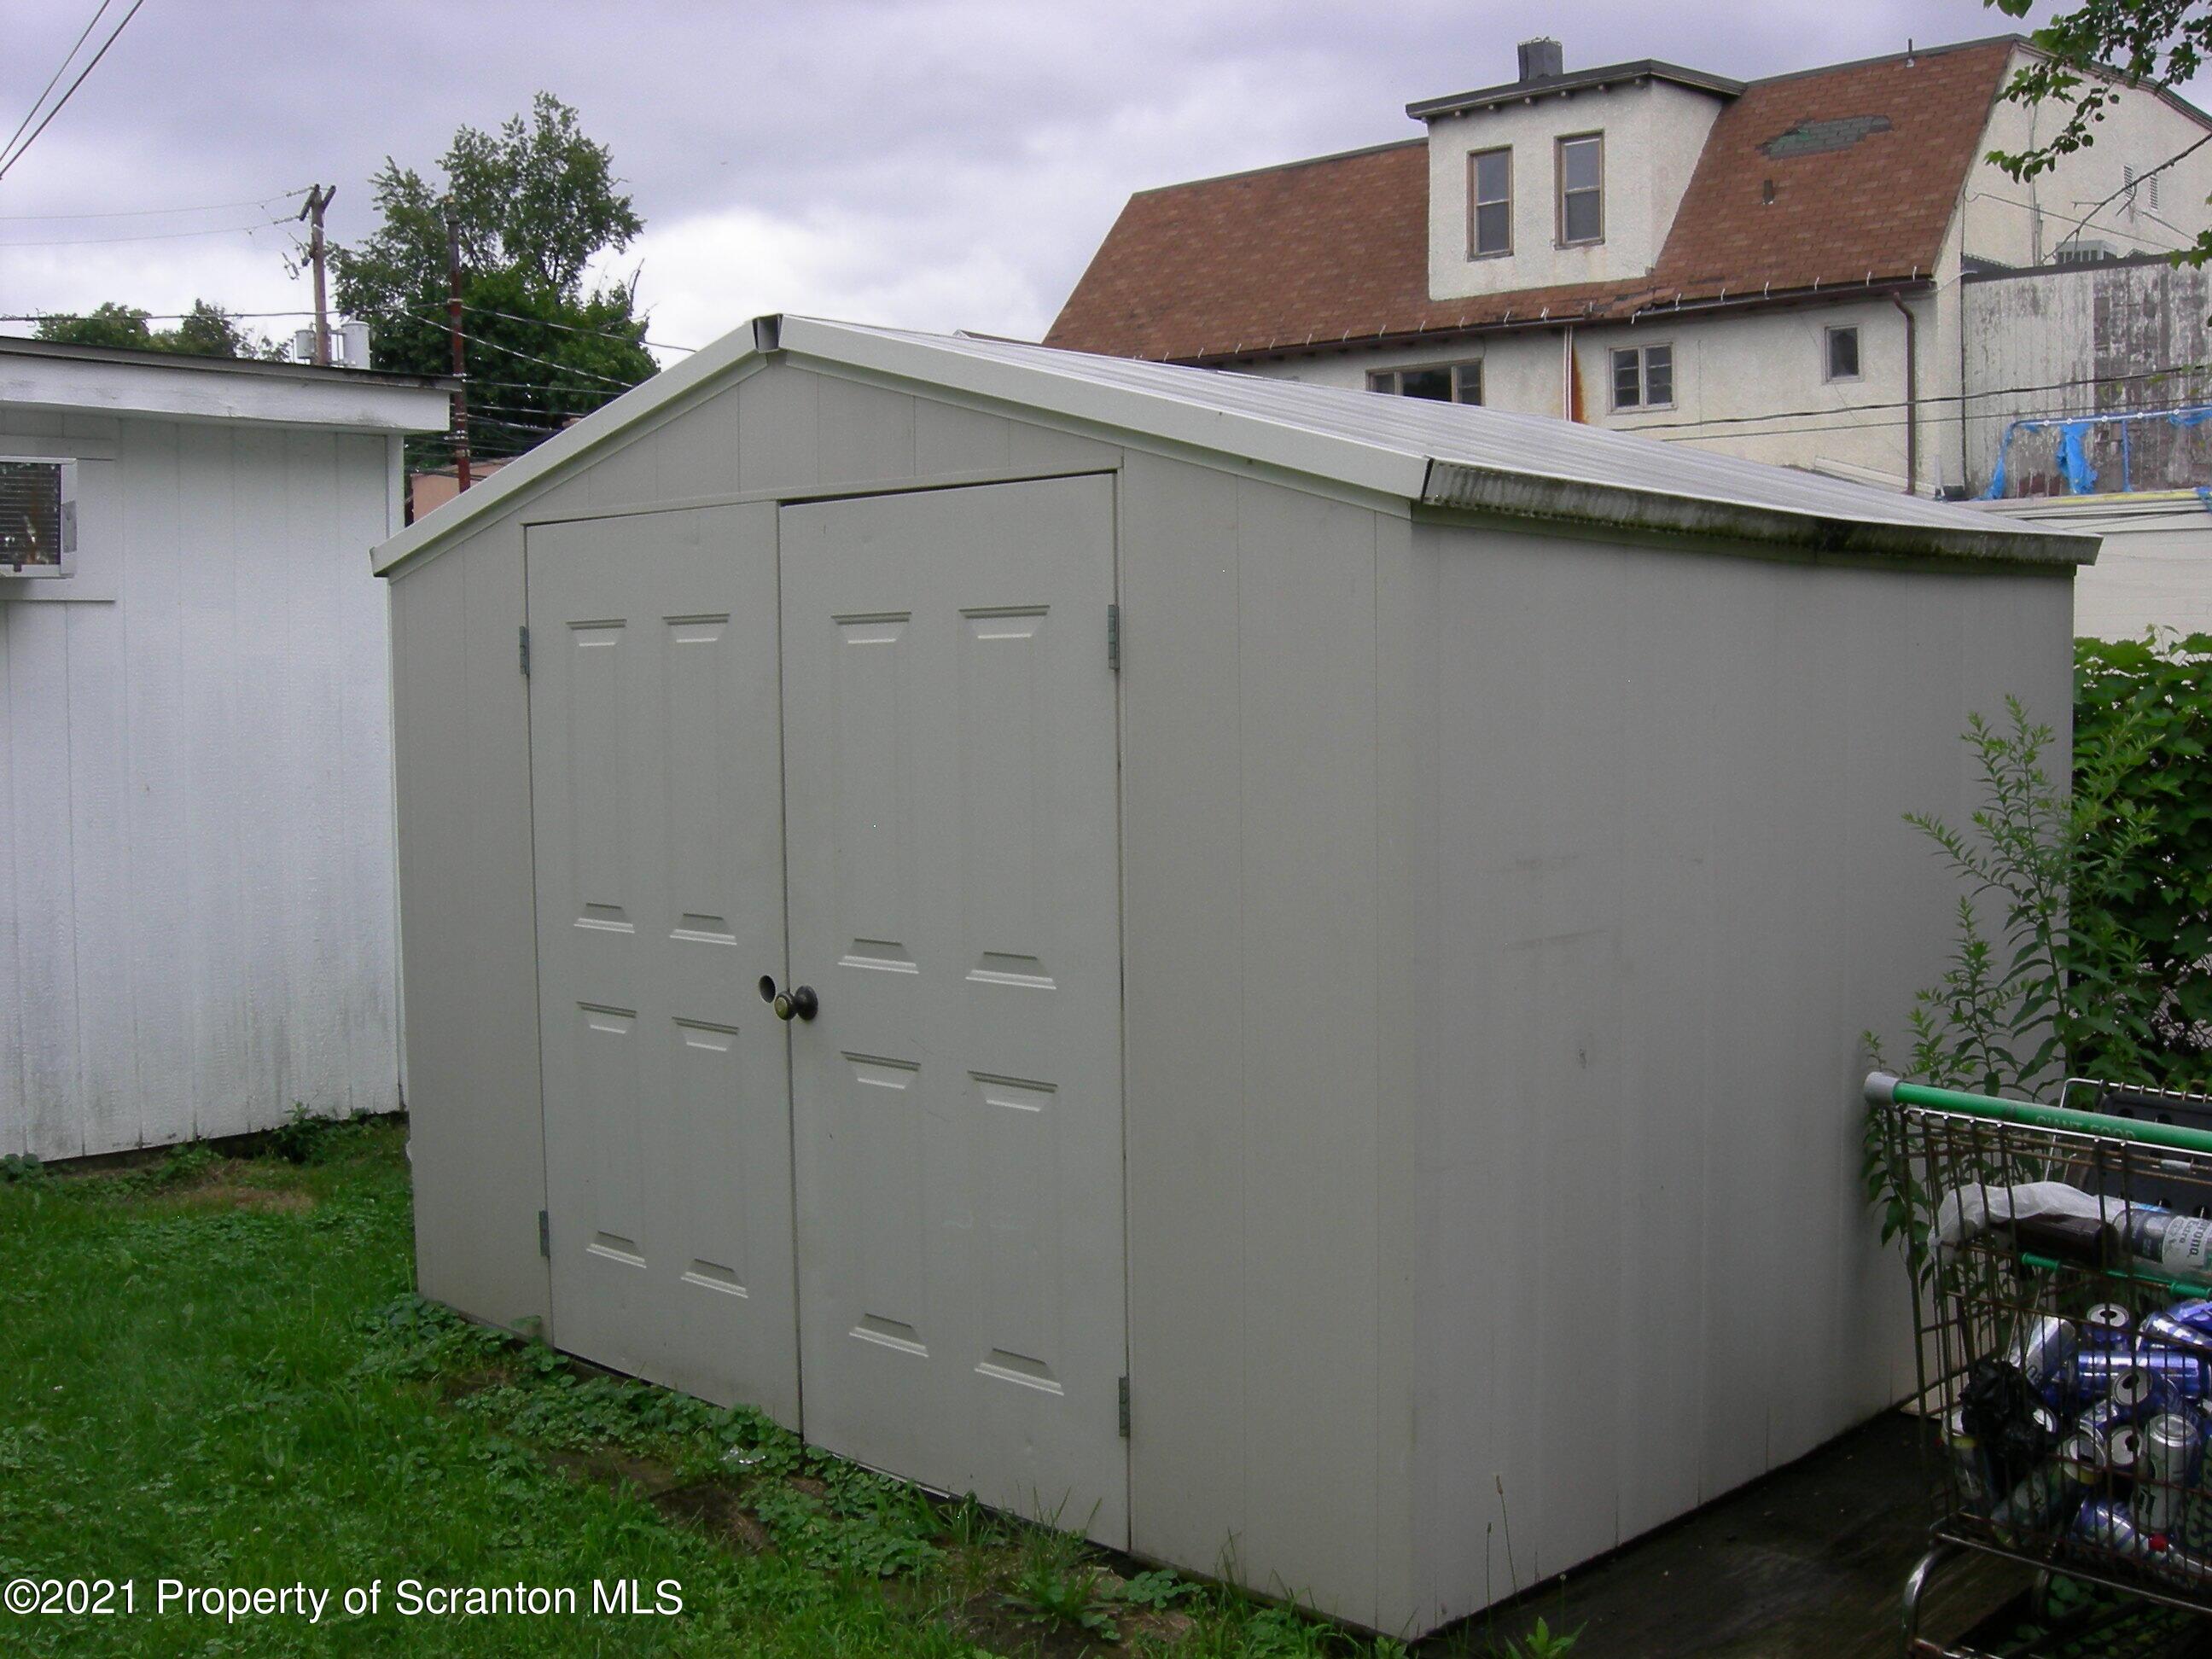 1506 Main Ave, Scranton, Pennsylvania 18508, ,2 BathroomsBathrooms,Commercial,For Sale,Main,21-3058